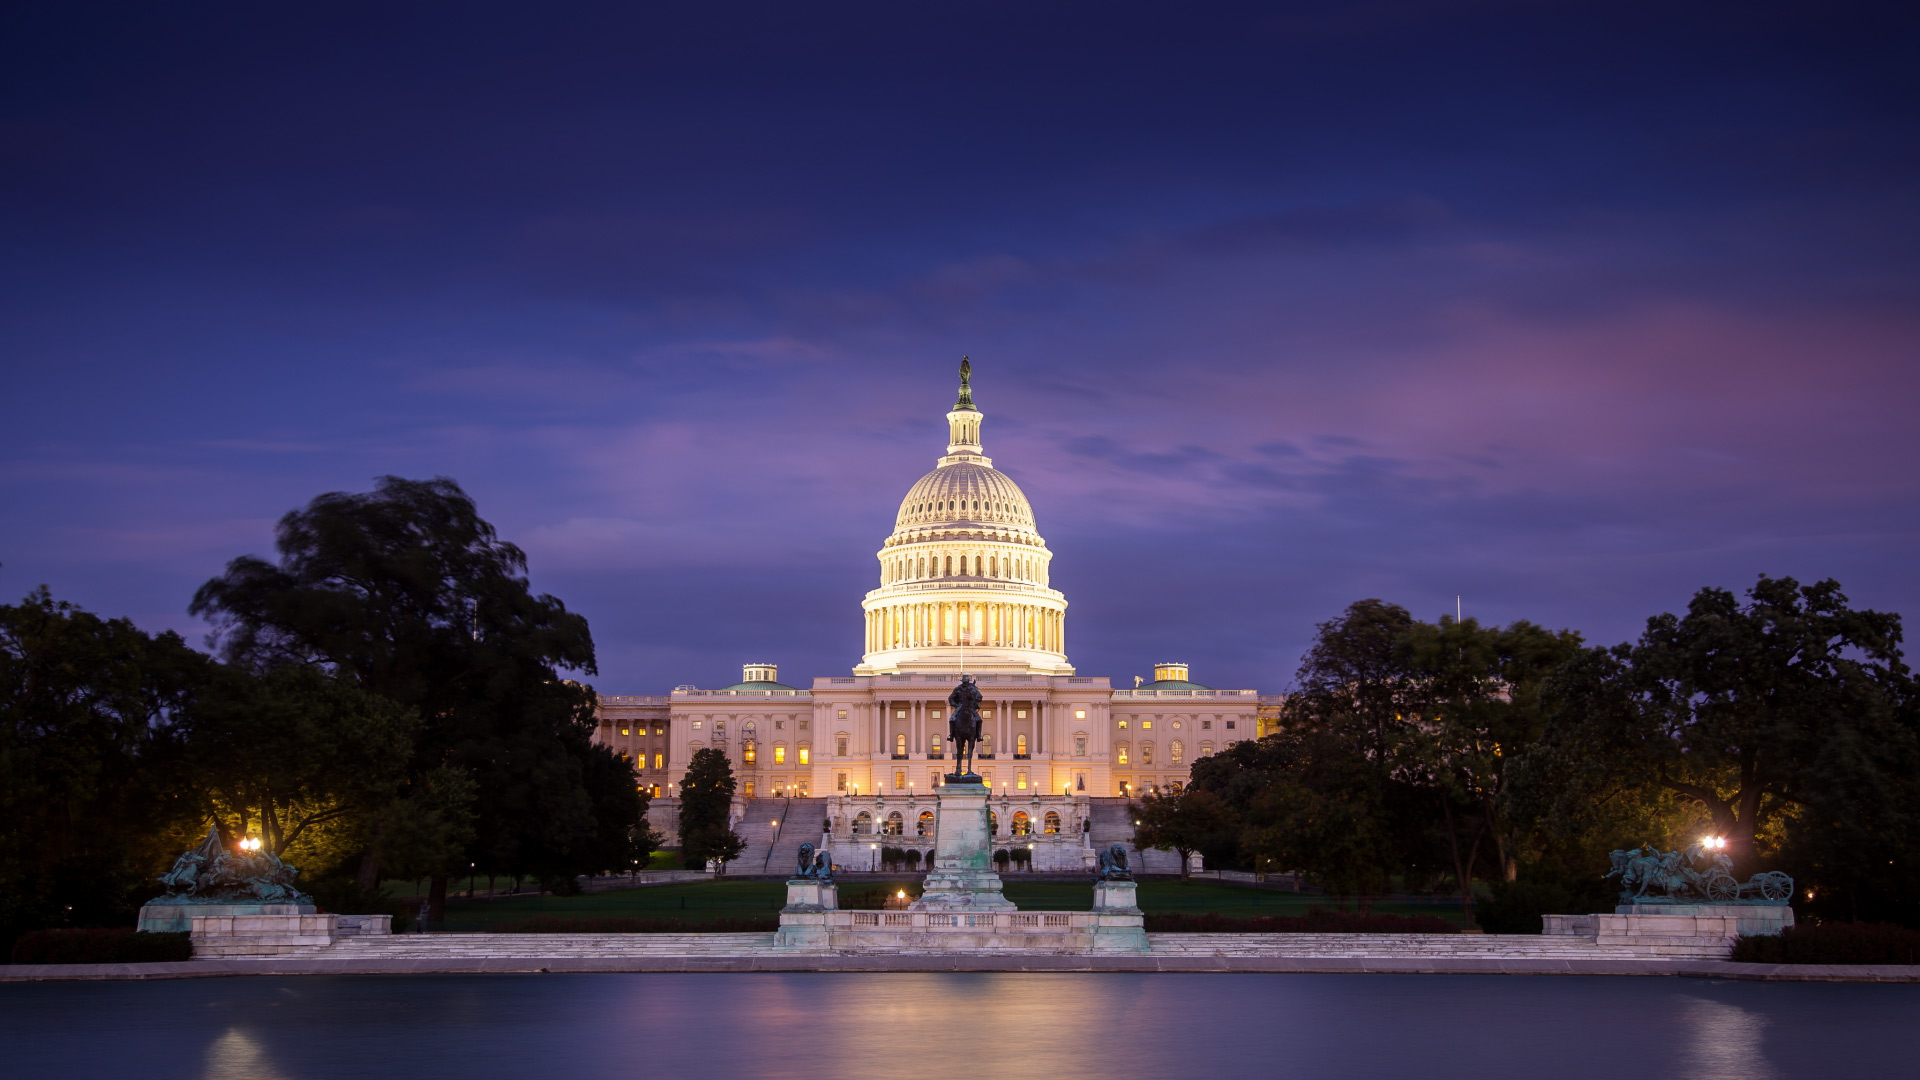 US Capitol Video Bing Wallpaper Download 1920x1080